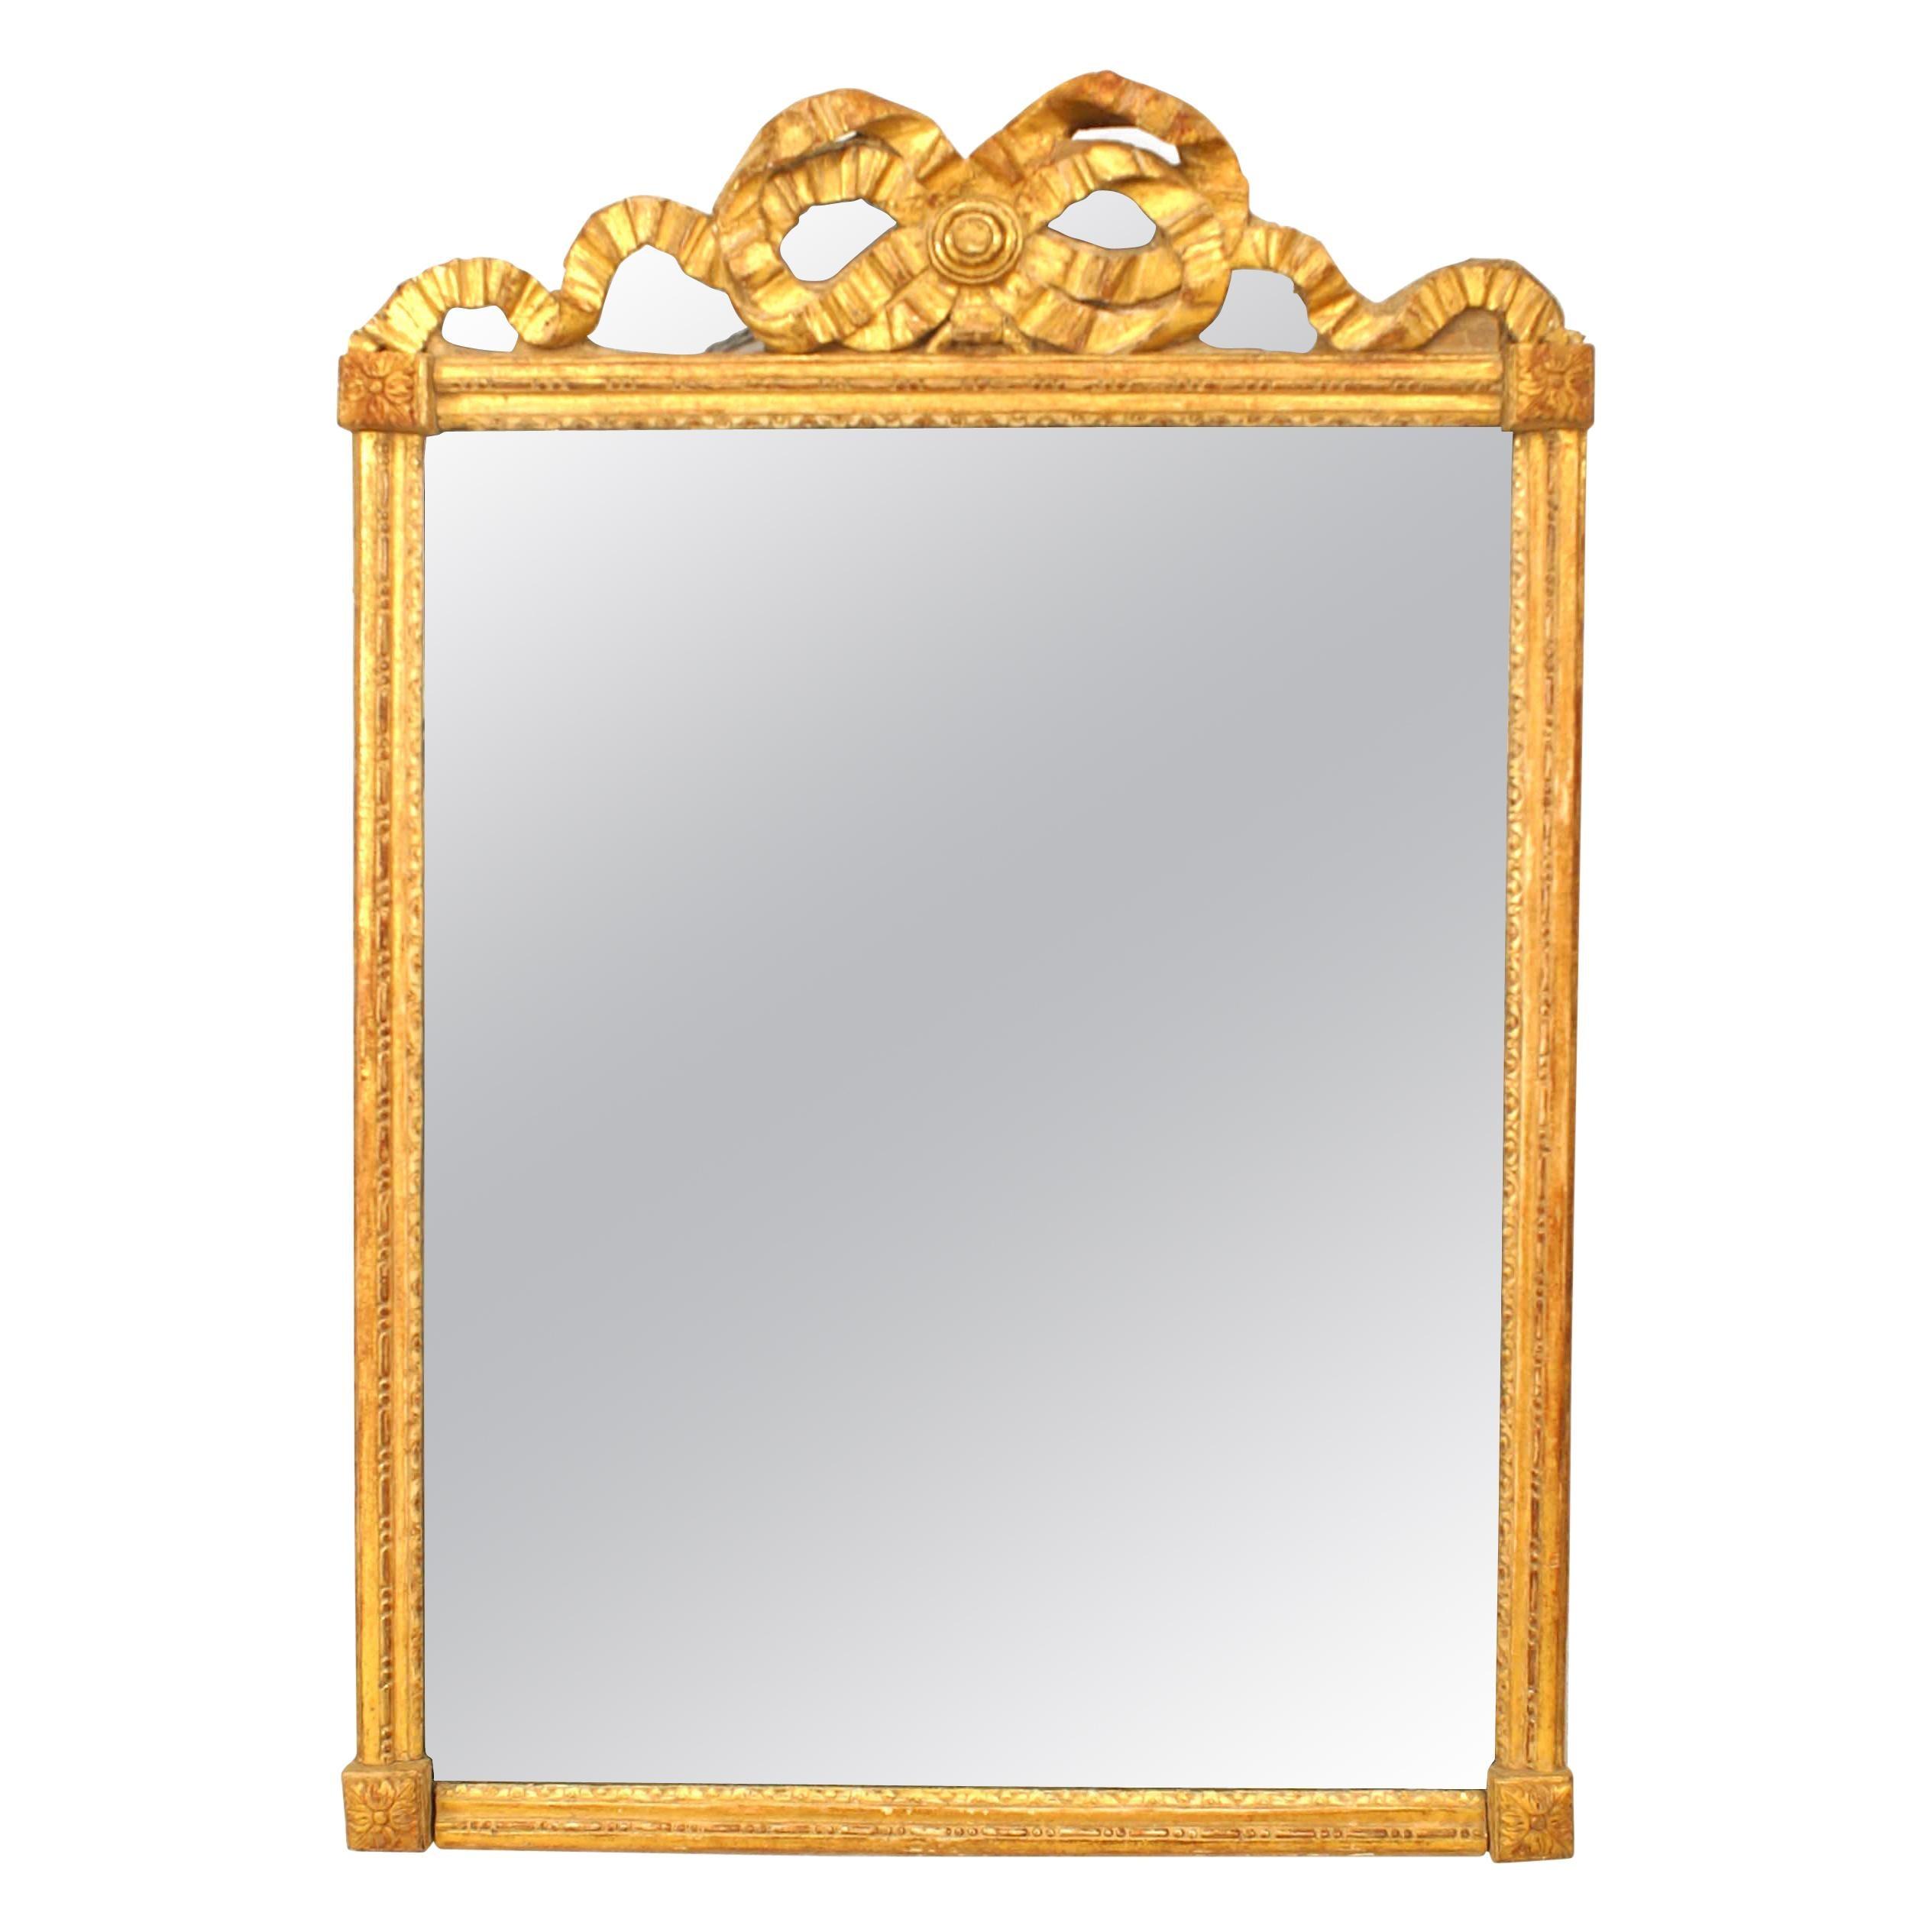 French Louis XVI Style Giltwood Wall Mirror